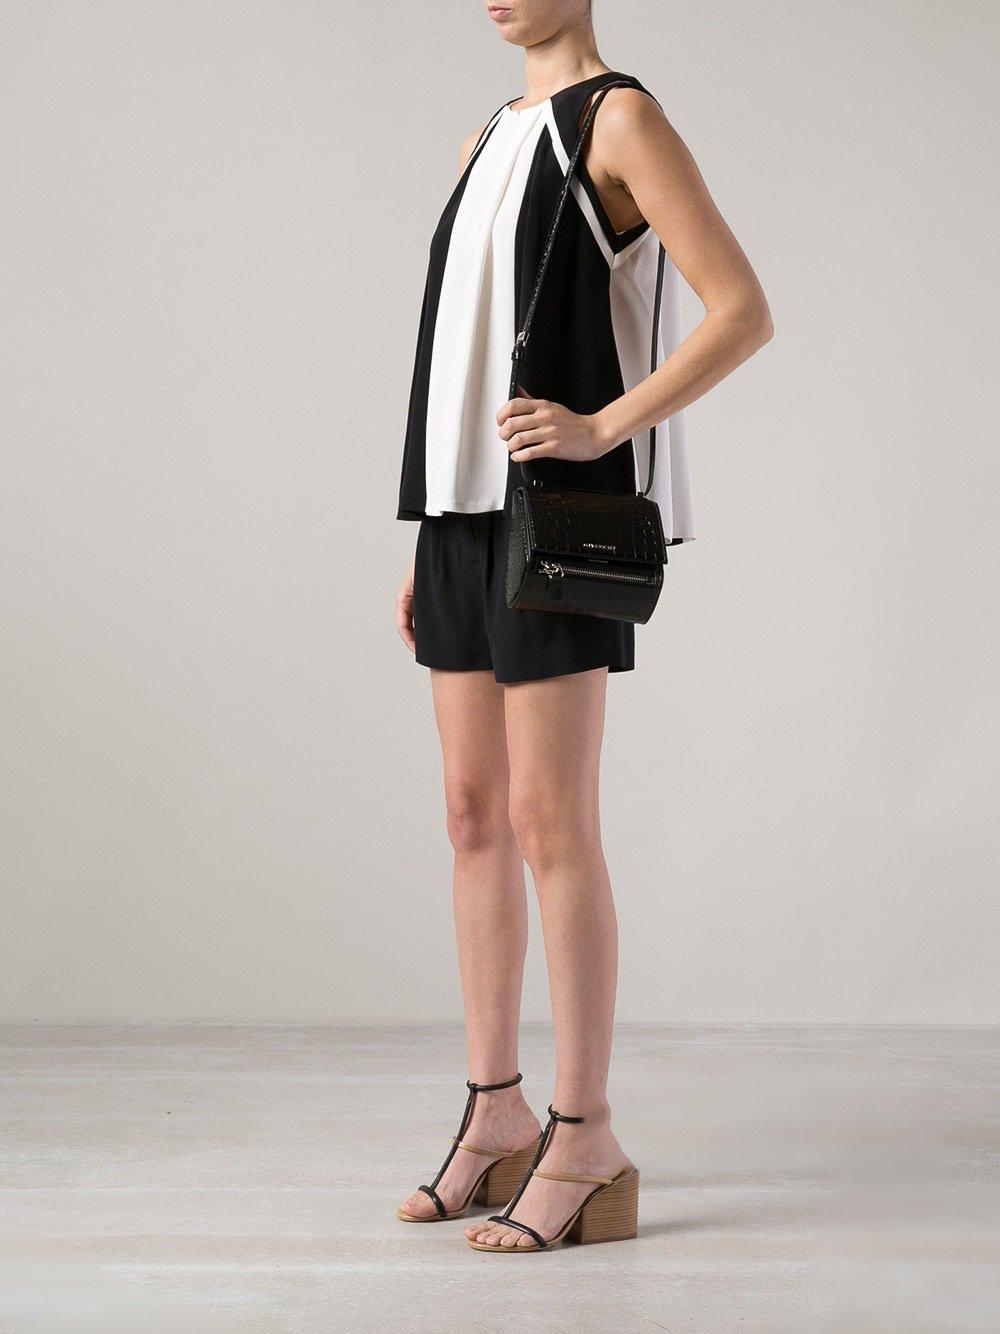 7536f34328 Givenchy Mini Pandora Box Bag in Black - Lyst